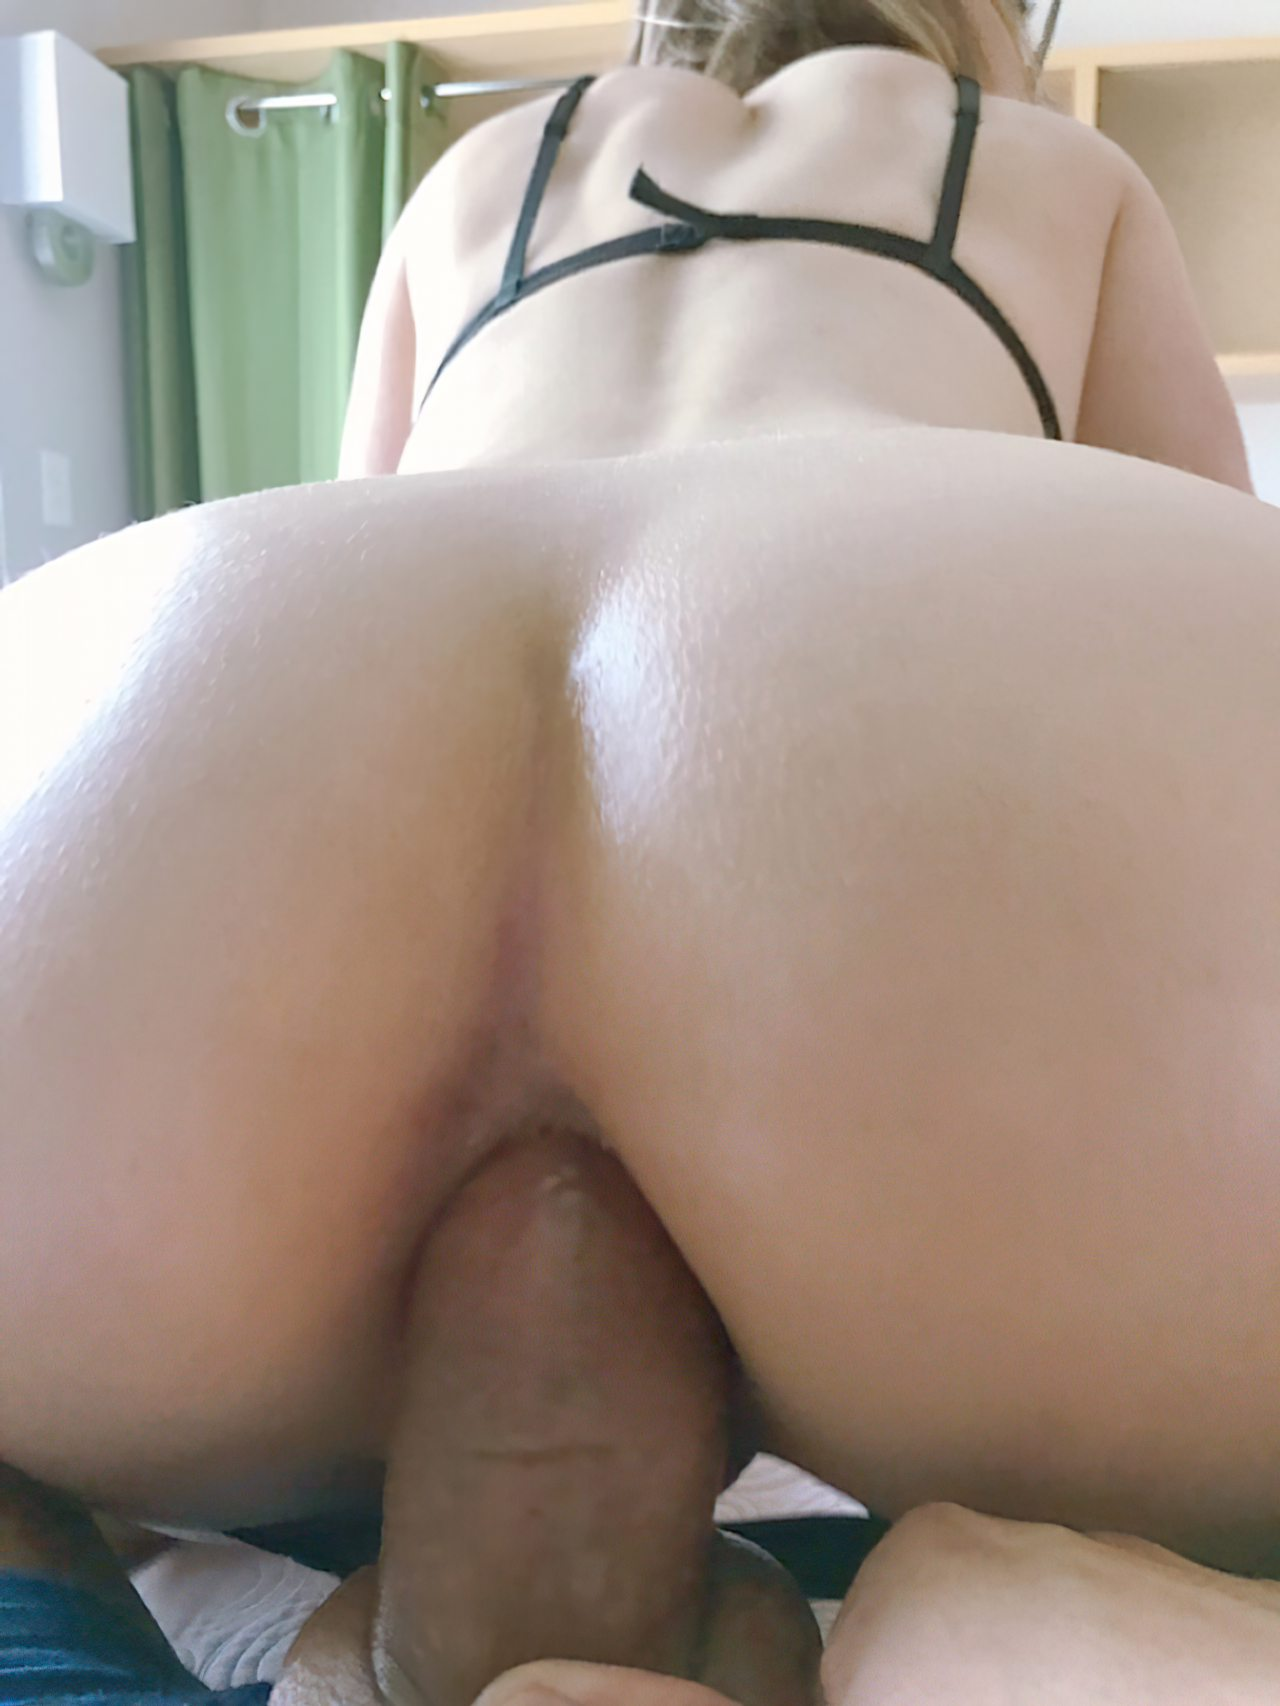 Sexo Anal Amadora Loirinha (6)